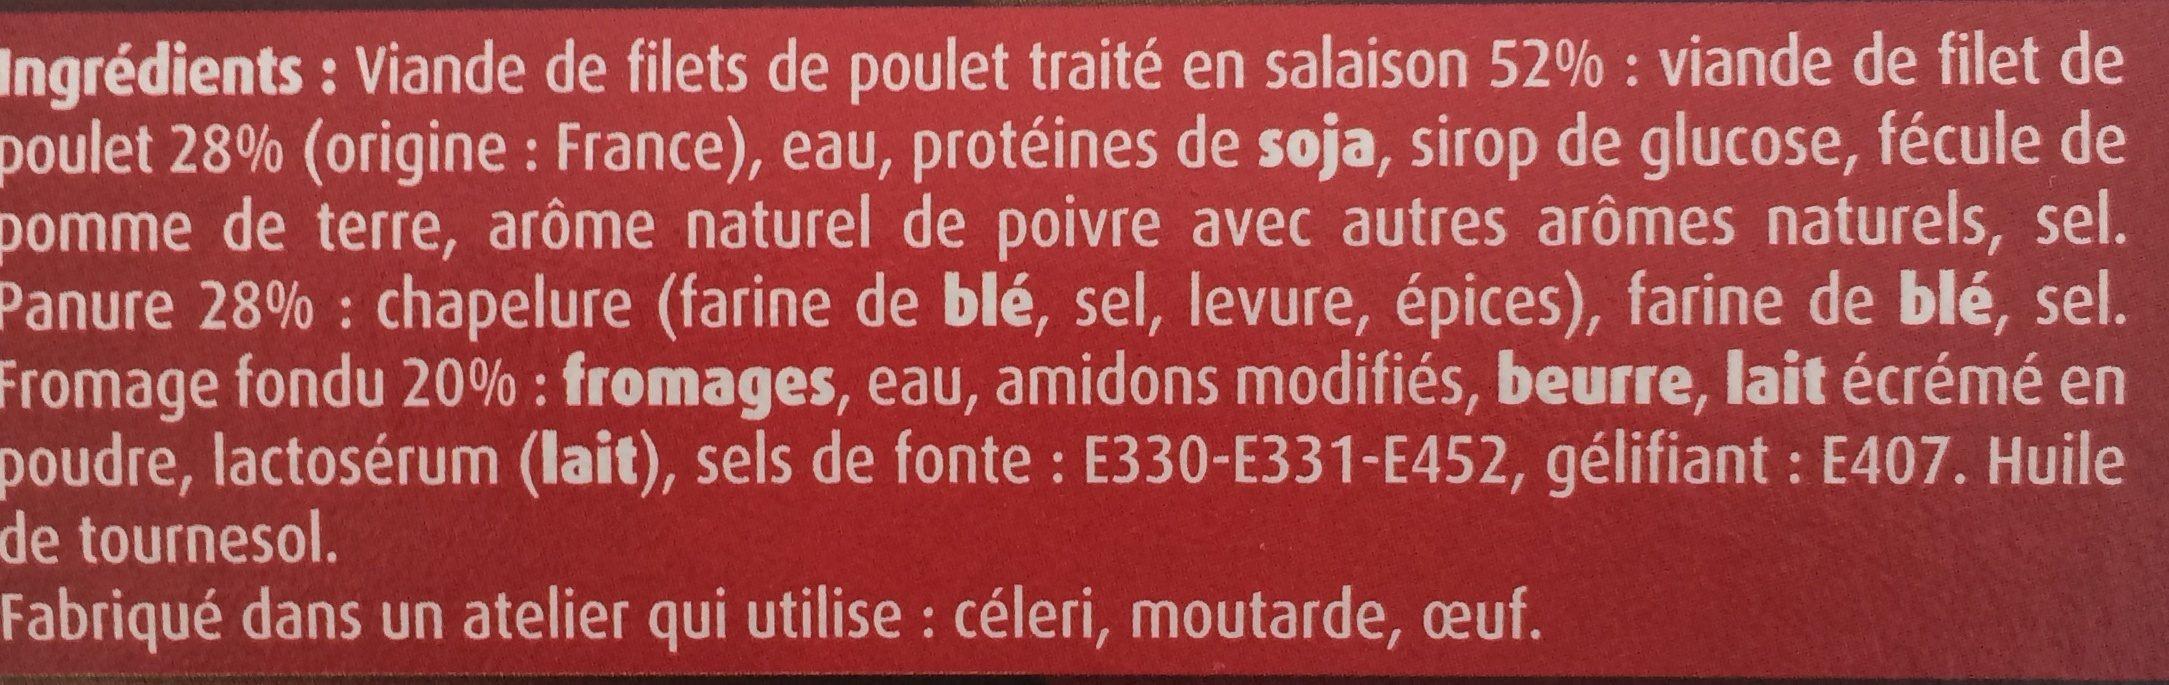 CroQ Double Fromage - Ingrediënten - fr